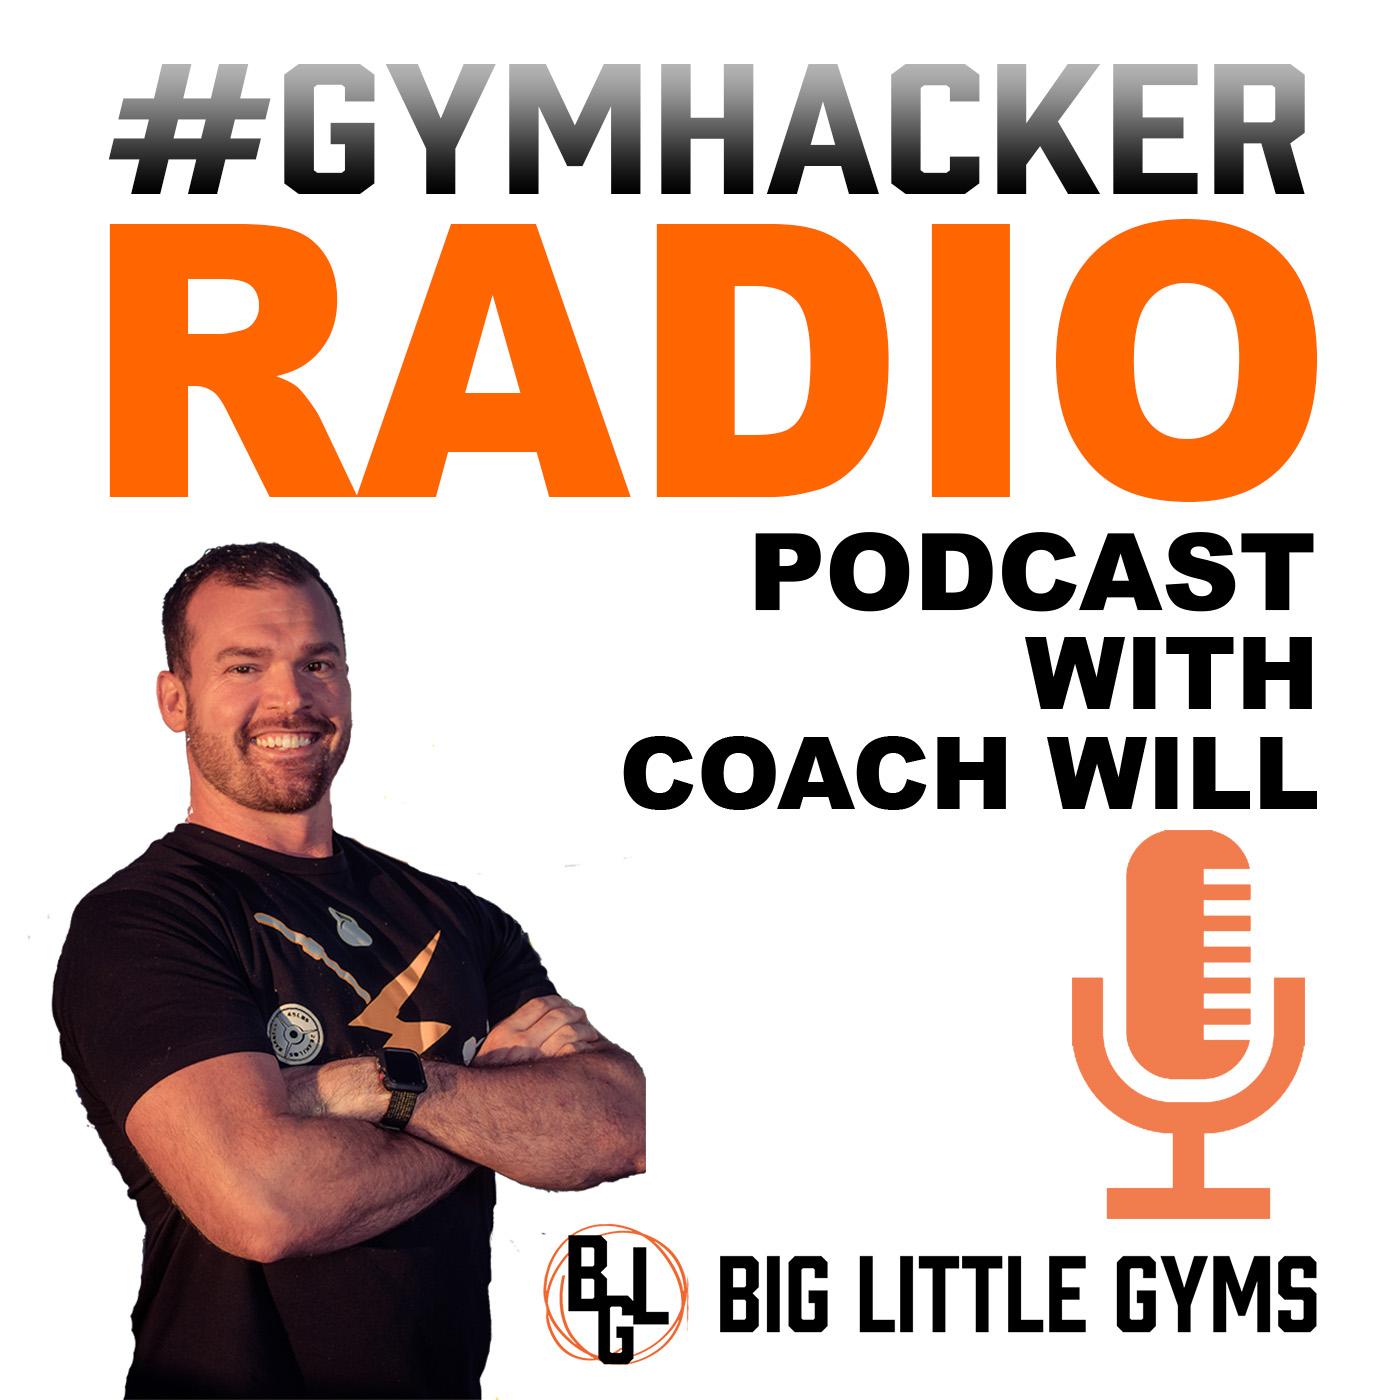 Gymhacker Radio show art